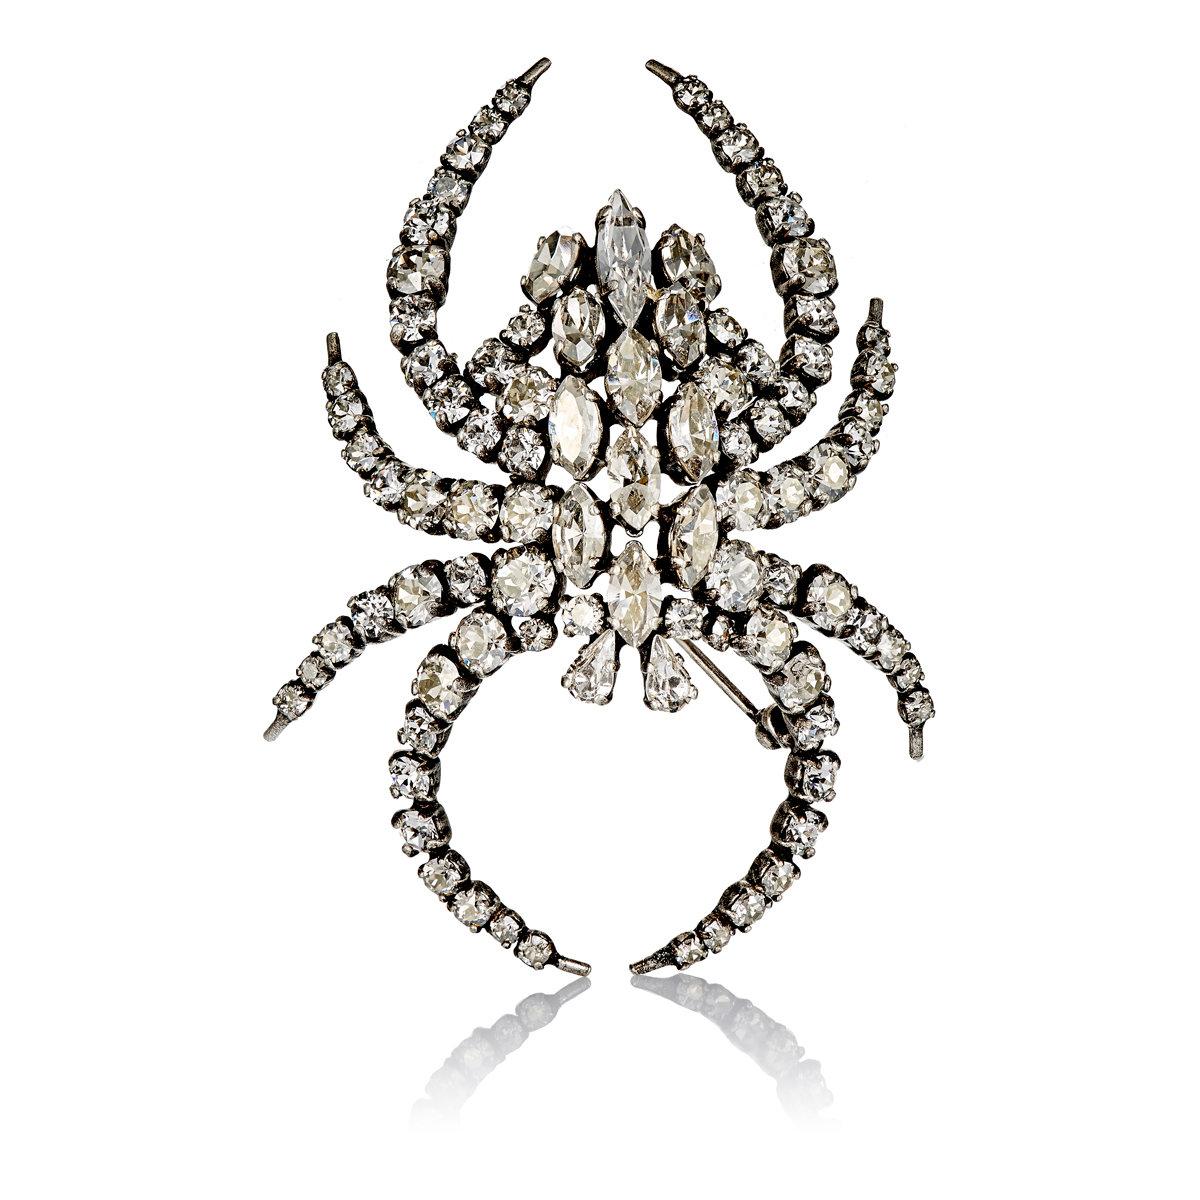 Moon crystal-embellished brooch Saint Laurent awMvTwxcN